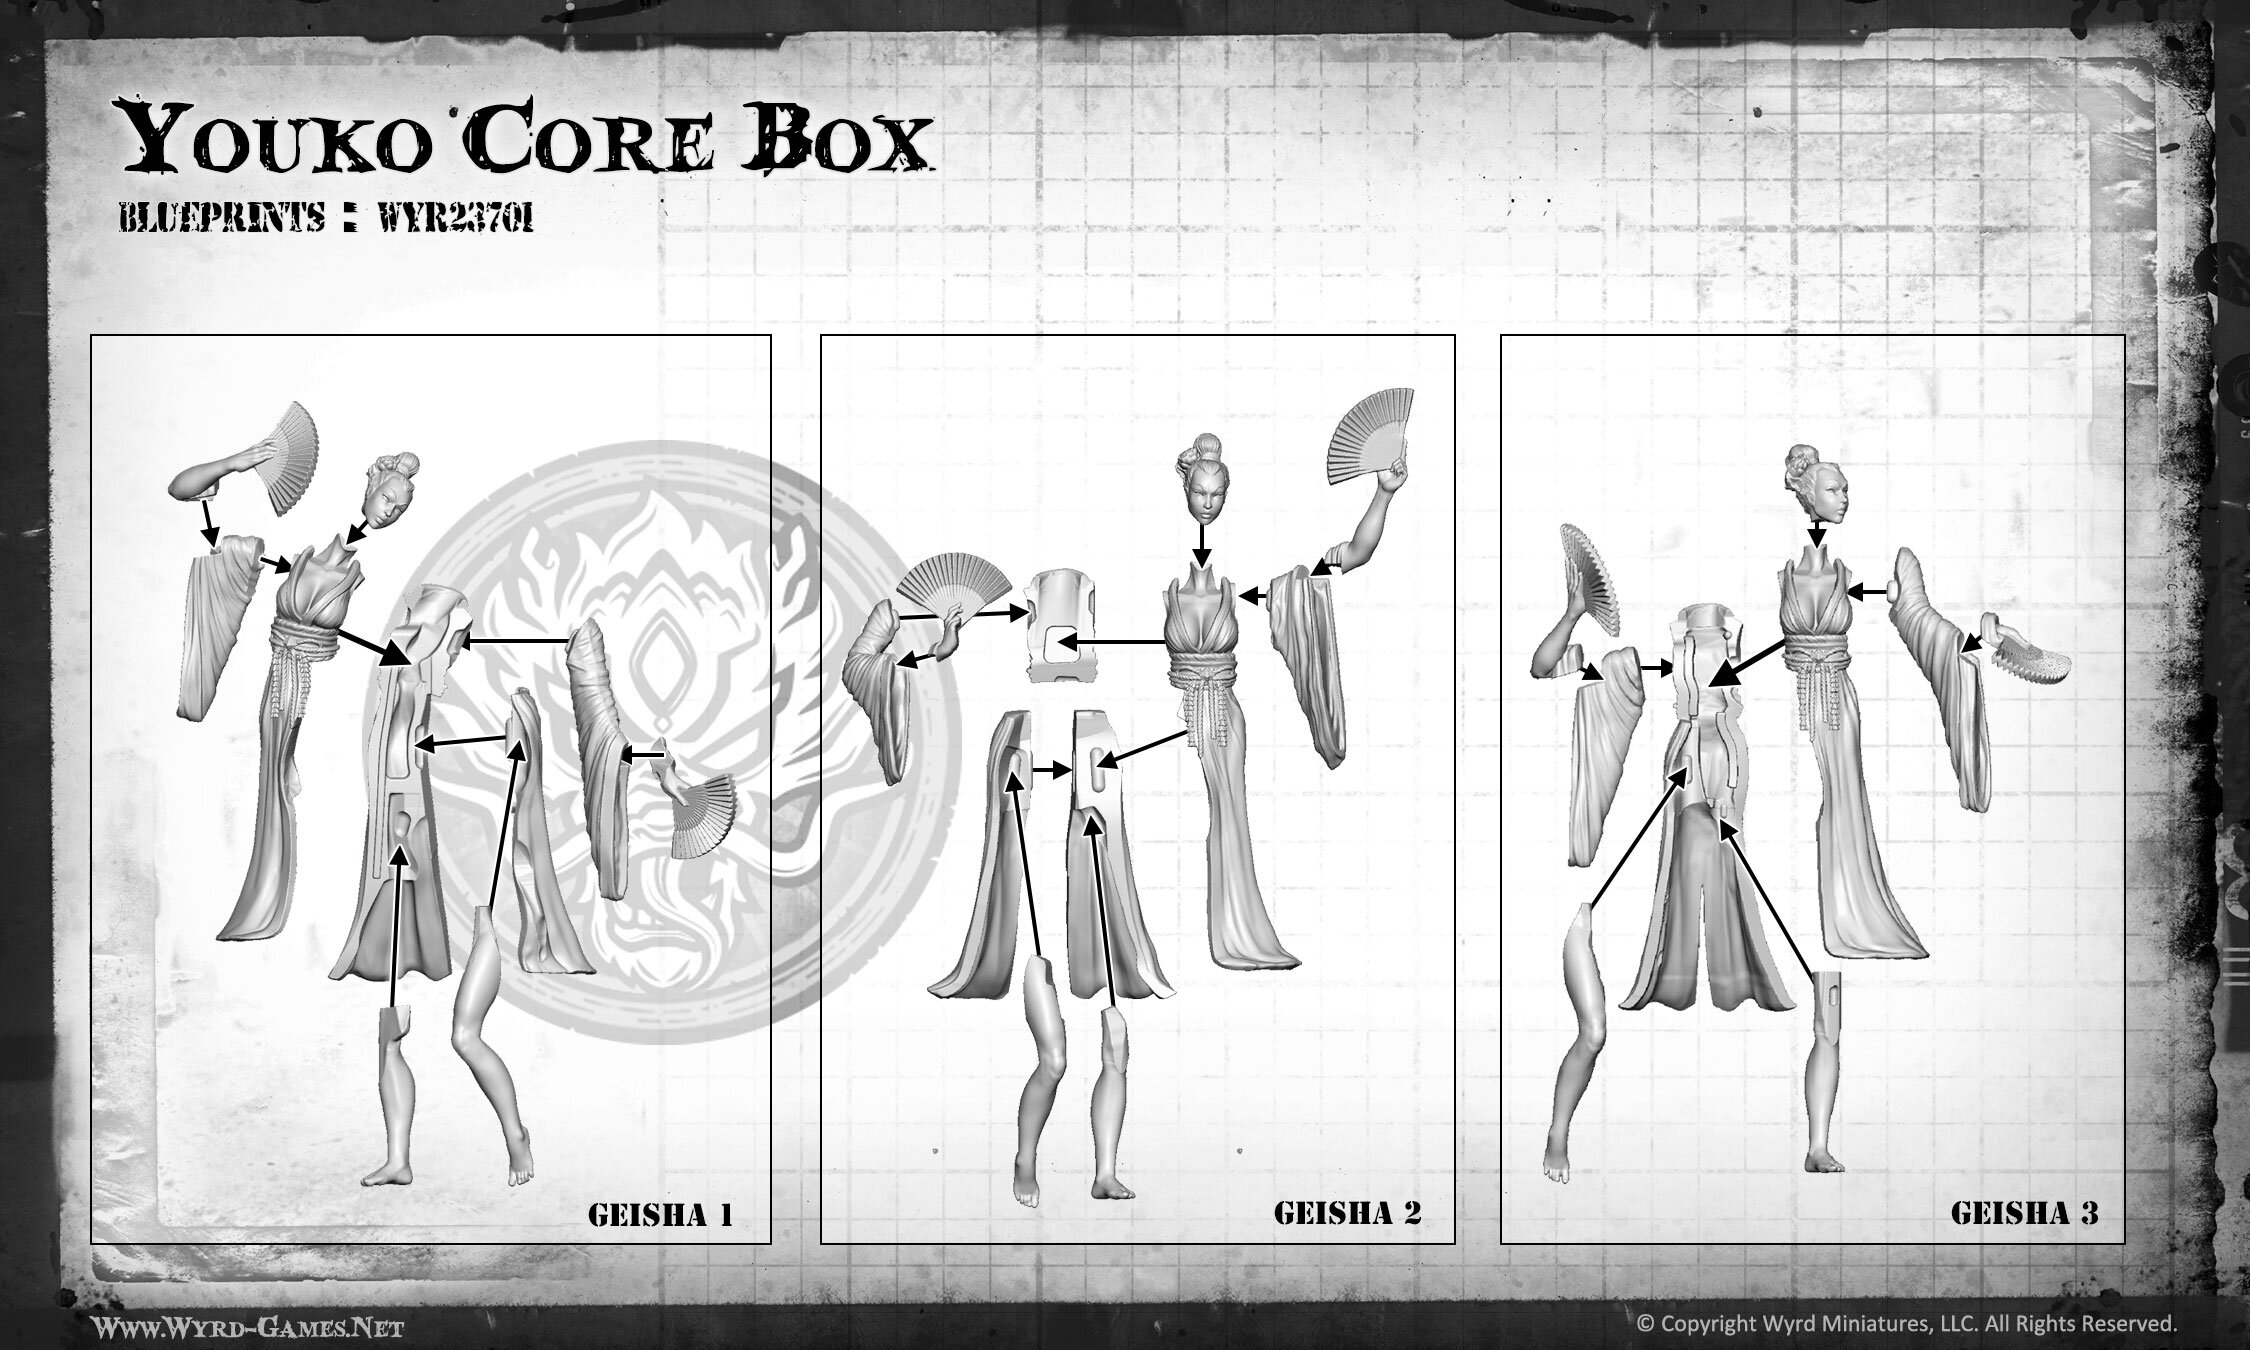 WYR23701-Youko-Core-Box-Geishas.jpg